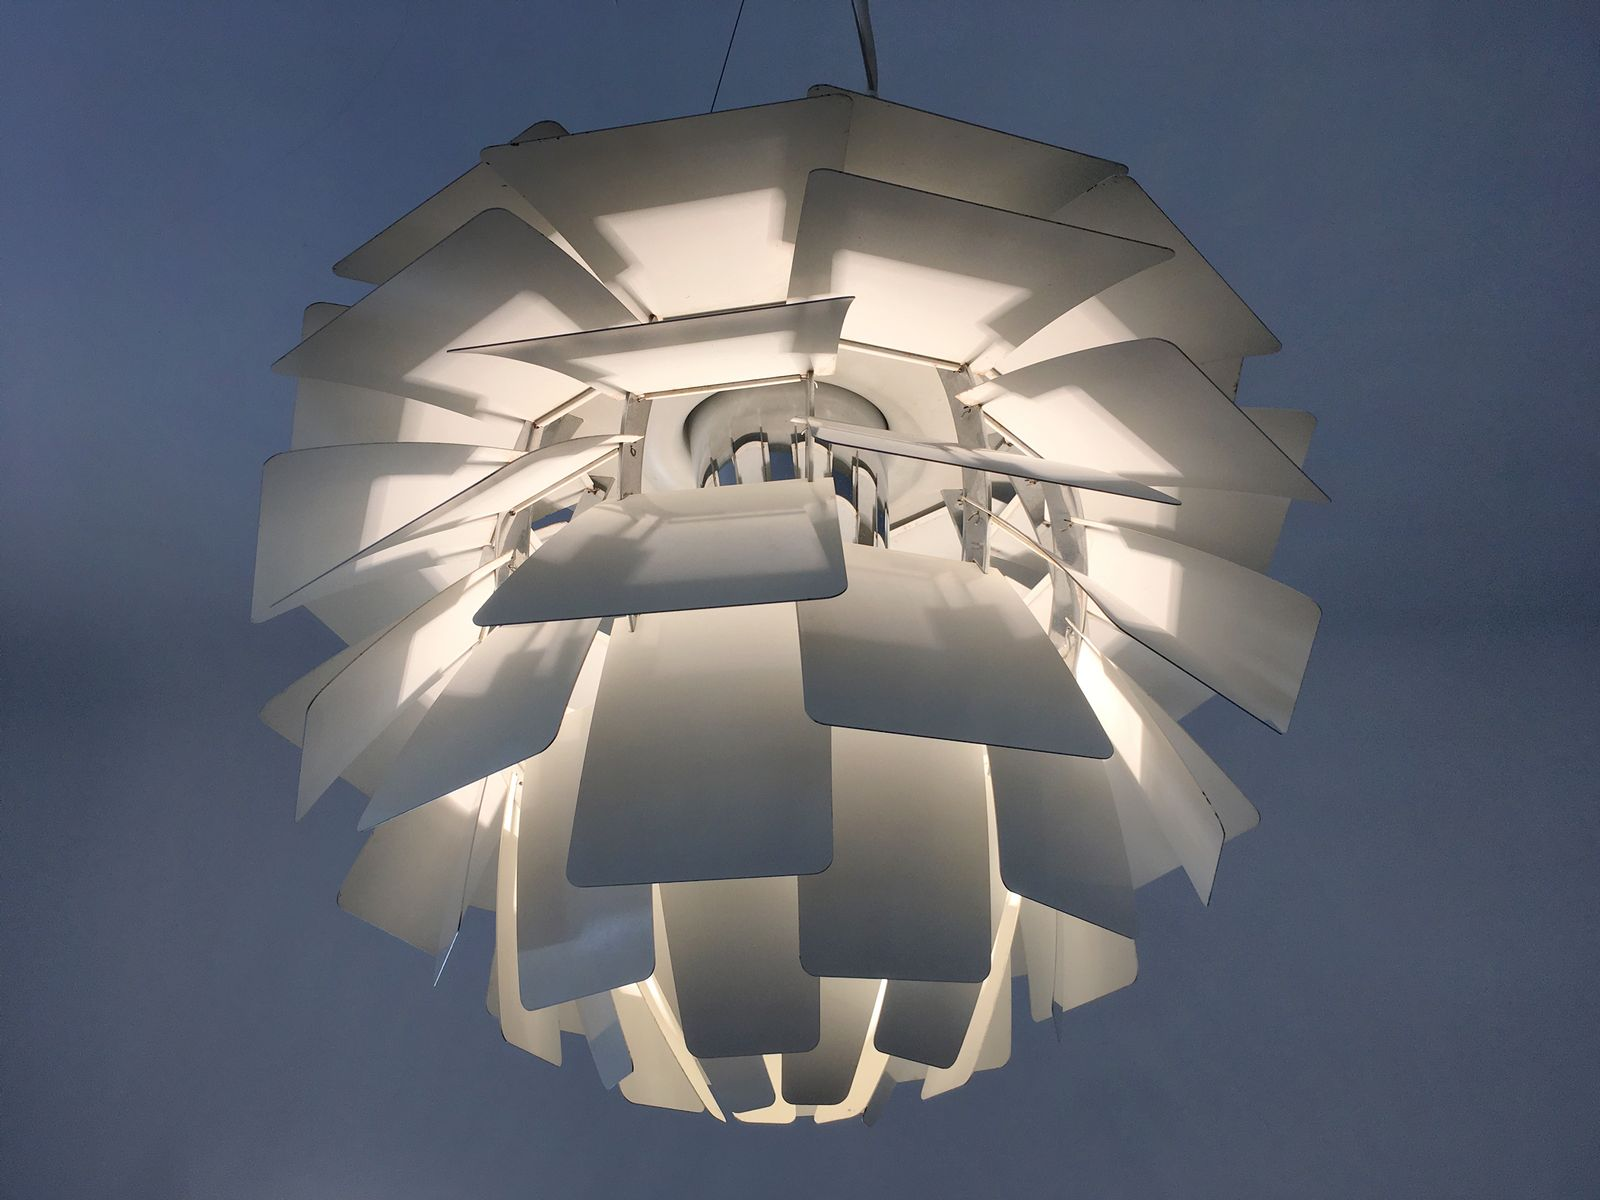 Vintage Artichoke Lamp By Poul Henningsen For Louis Poulsen